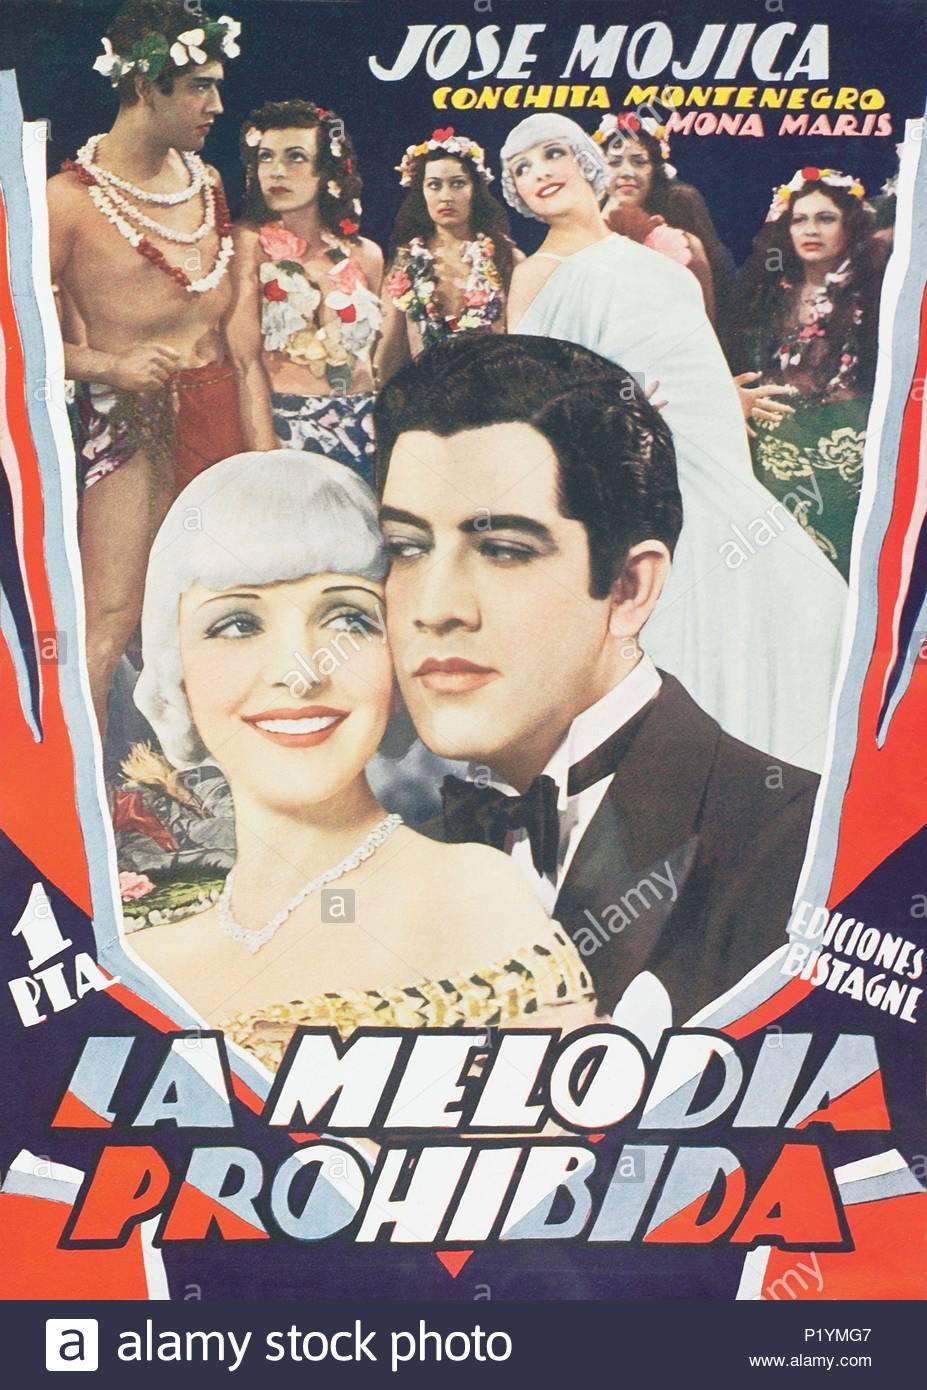 Mona Maris, José Mojica, Conchita Montenegro, and Carmen Rodríguez in Melodía prohibida (1933)